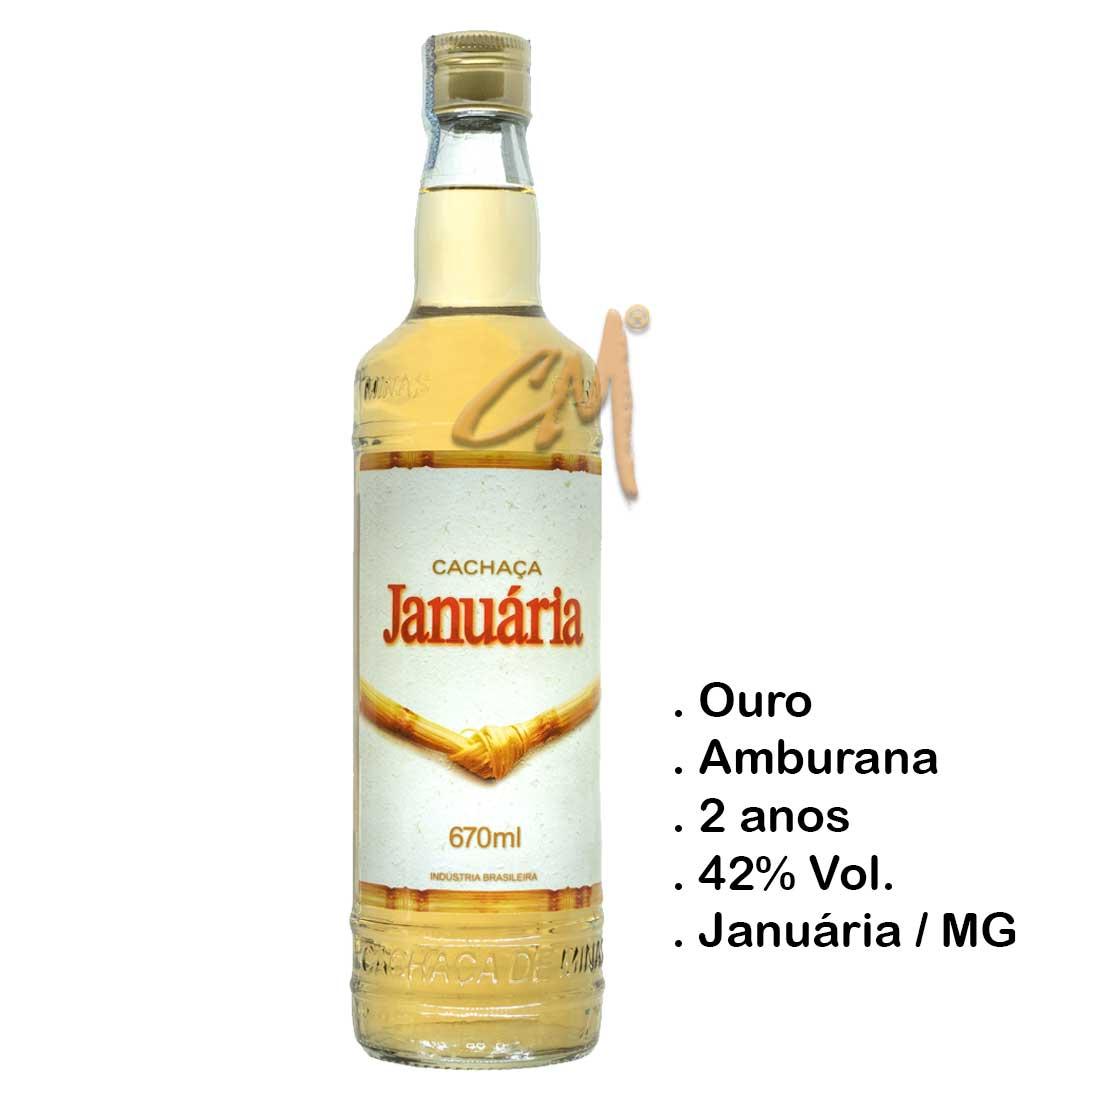 Cachaça Januária 670 ml (Januária - MG)